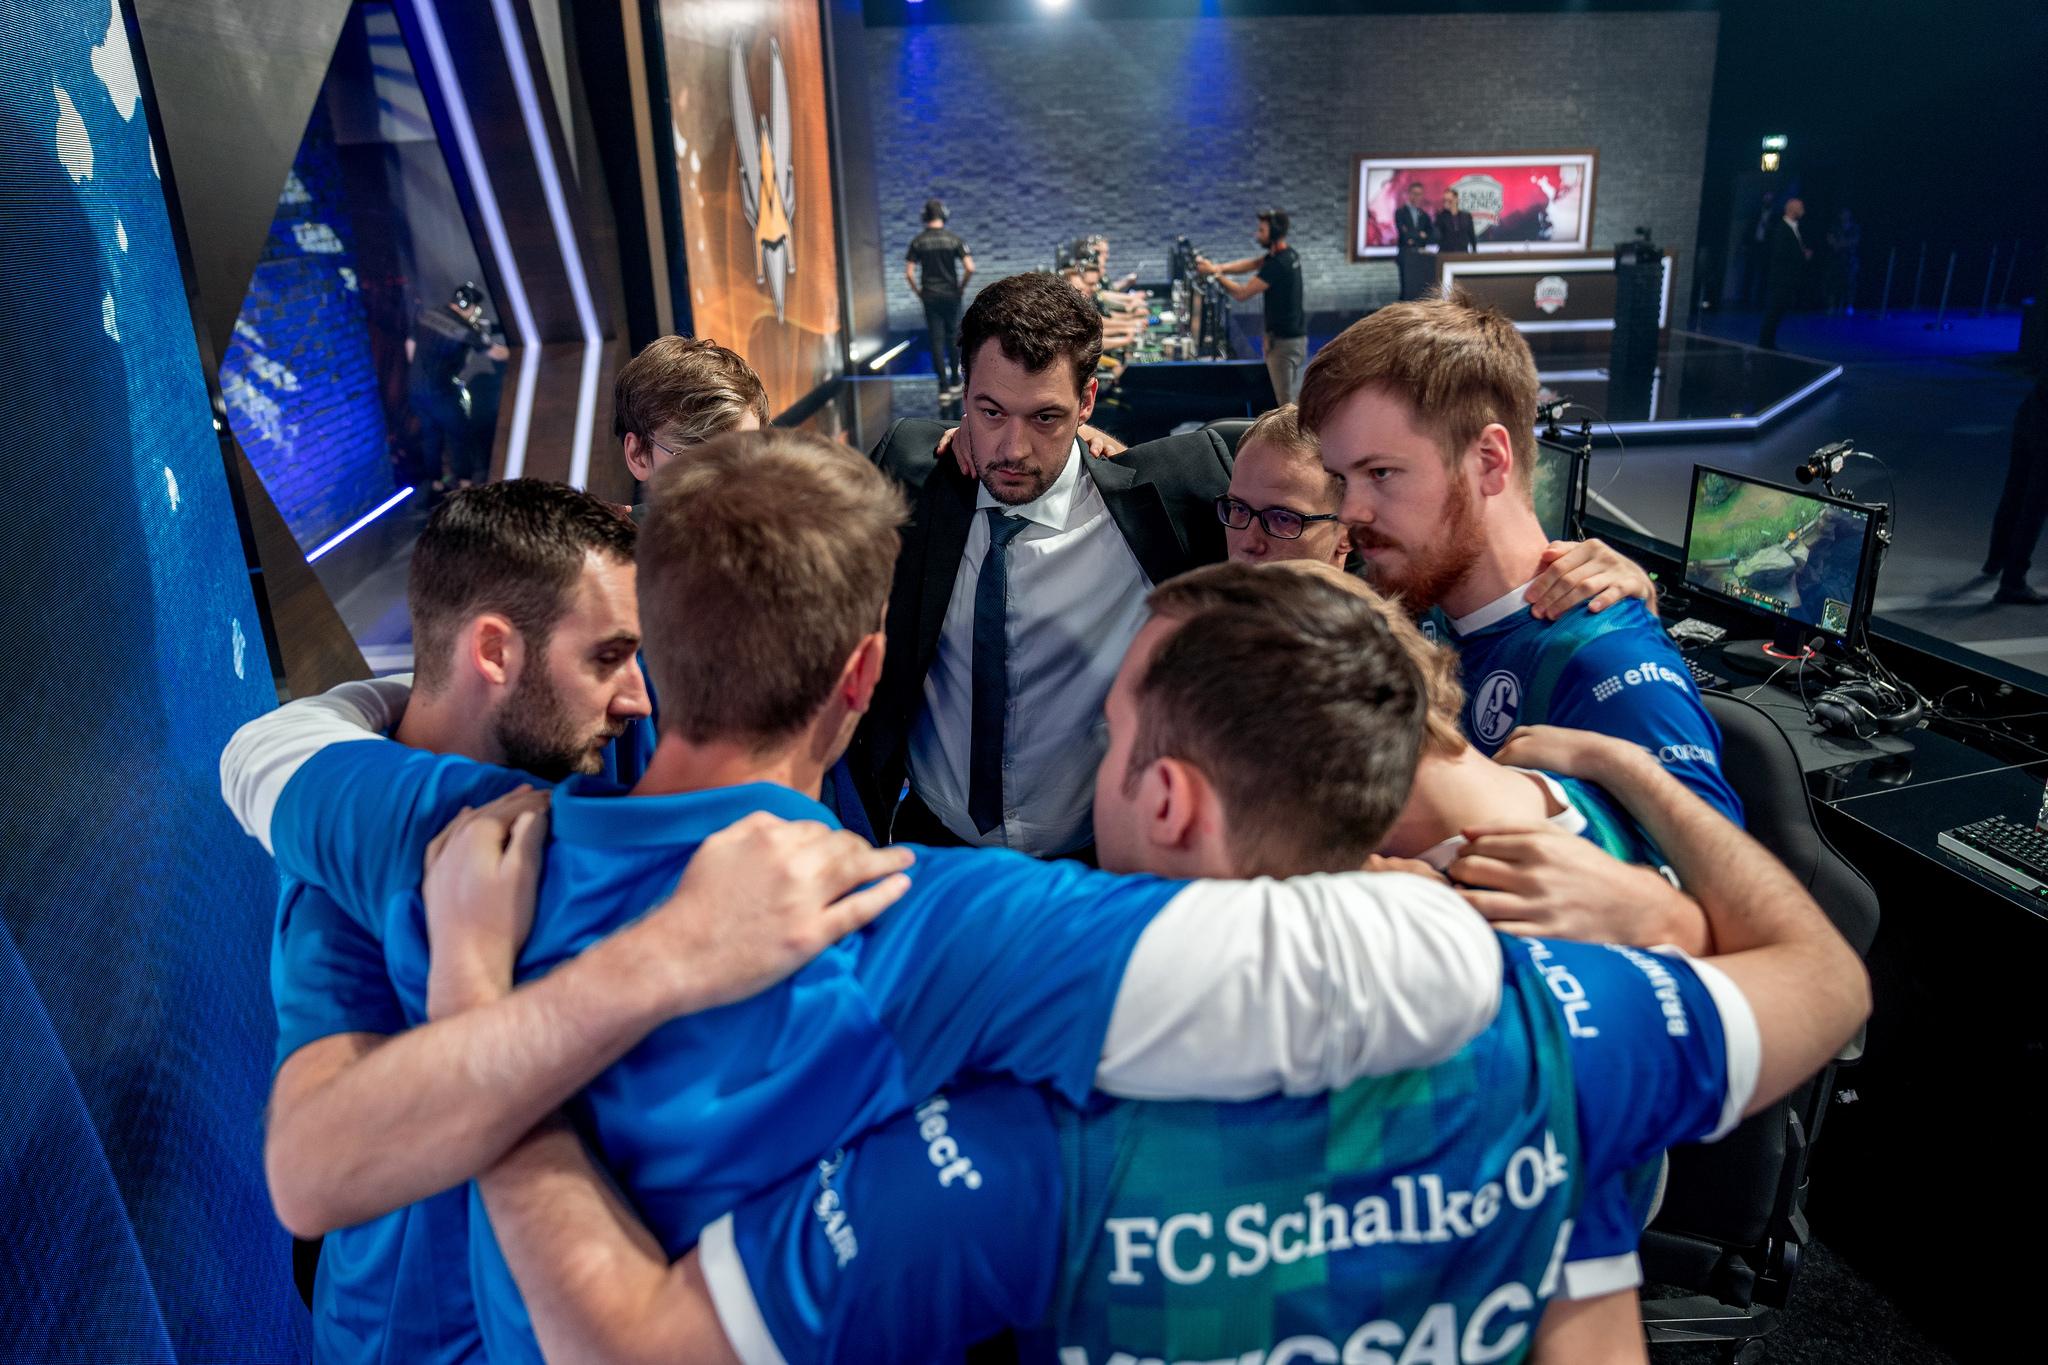 4e9fd8abc Schalke showcased the success of its League team at a recent Bundesliga game